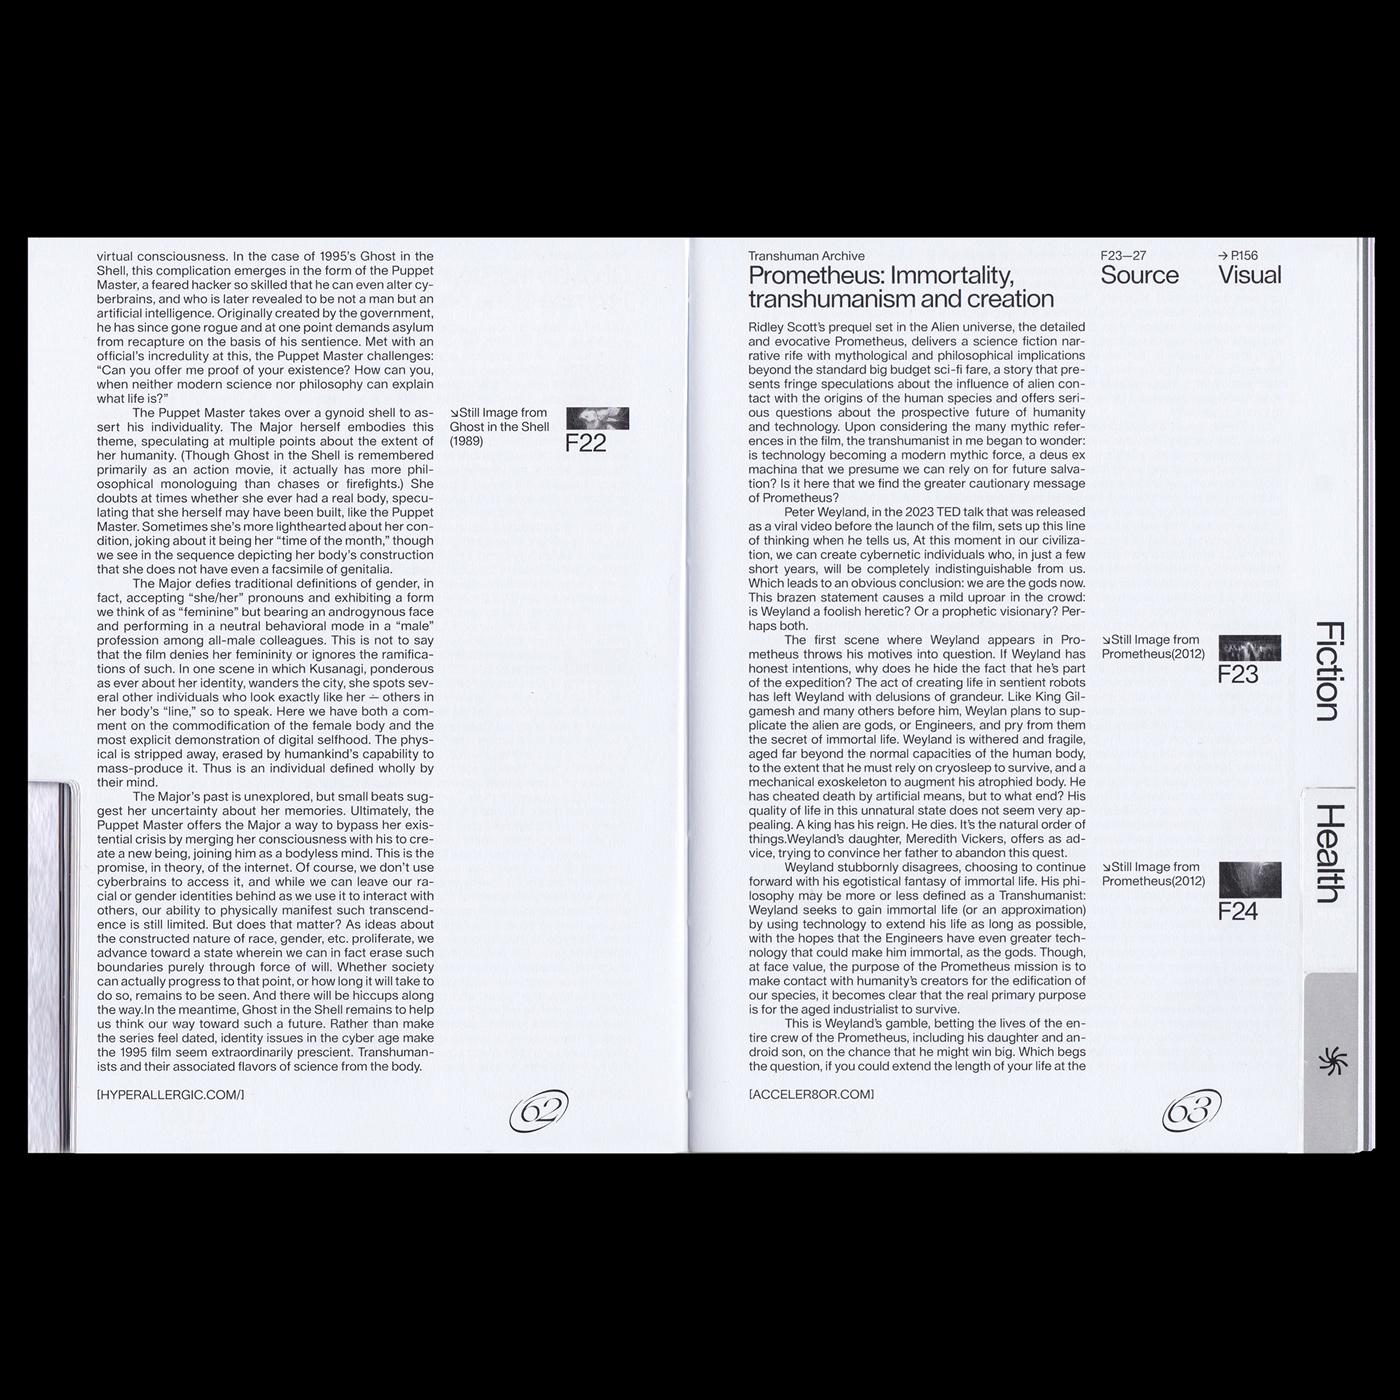 06 collide24 Transhuman Archive Stella Klump Leonie Krein Moritz Büsselberg - The book 'Transhuman Archive' by Stella Klump, Leonie Krein and Moritz Büsselberg explores the effects of transhumanism in our times